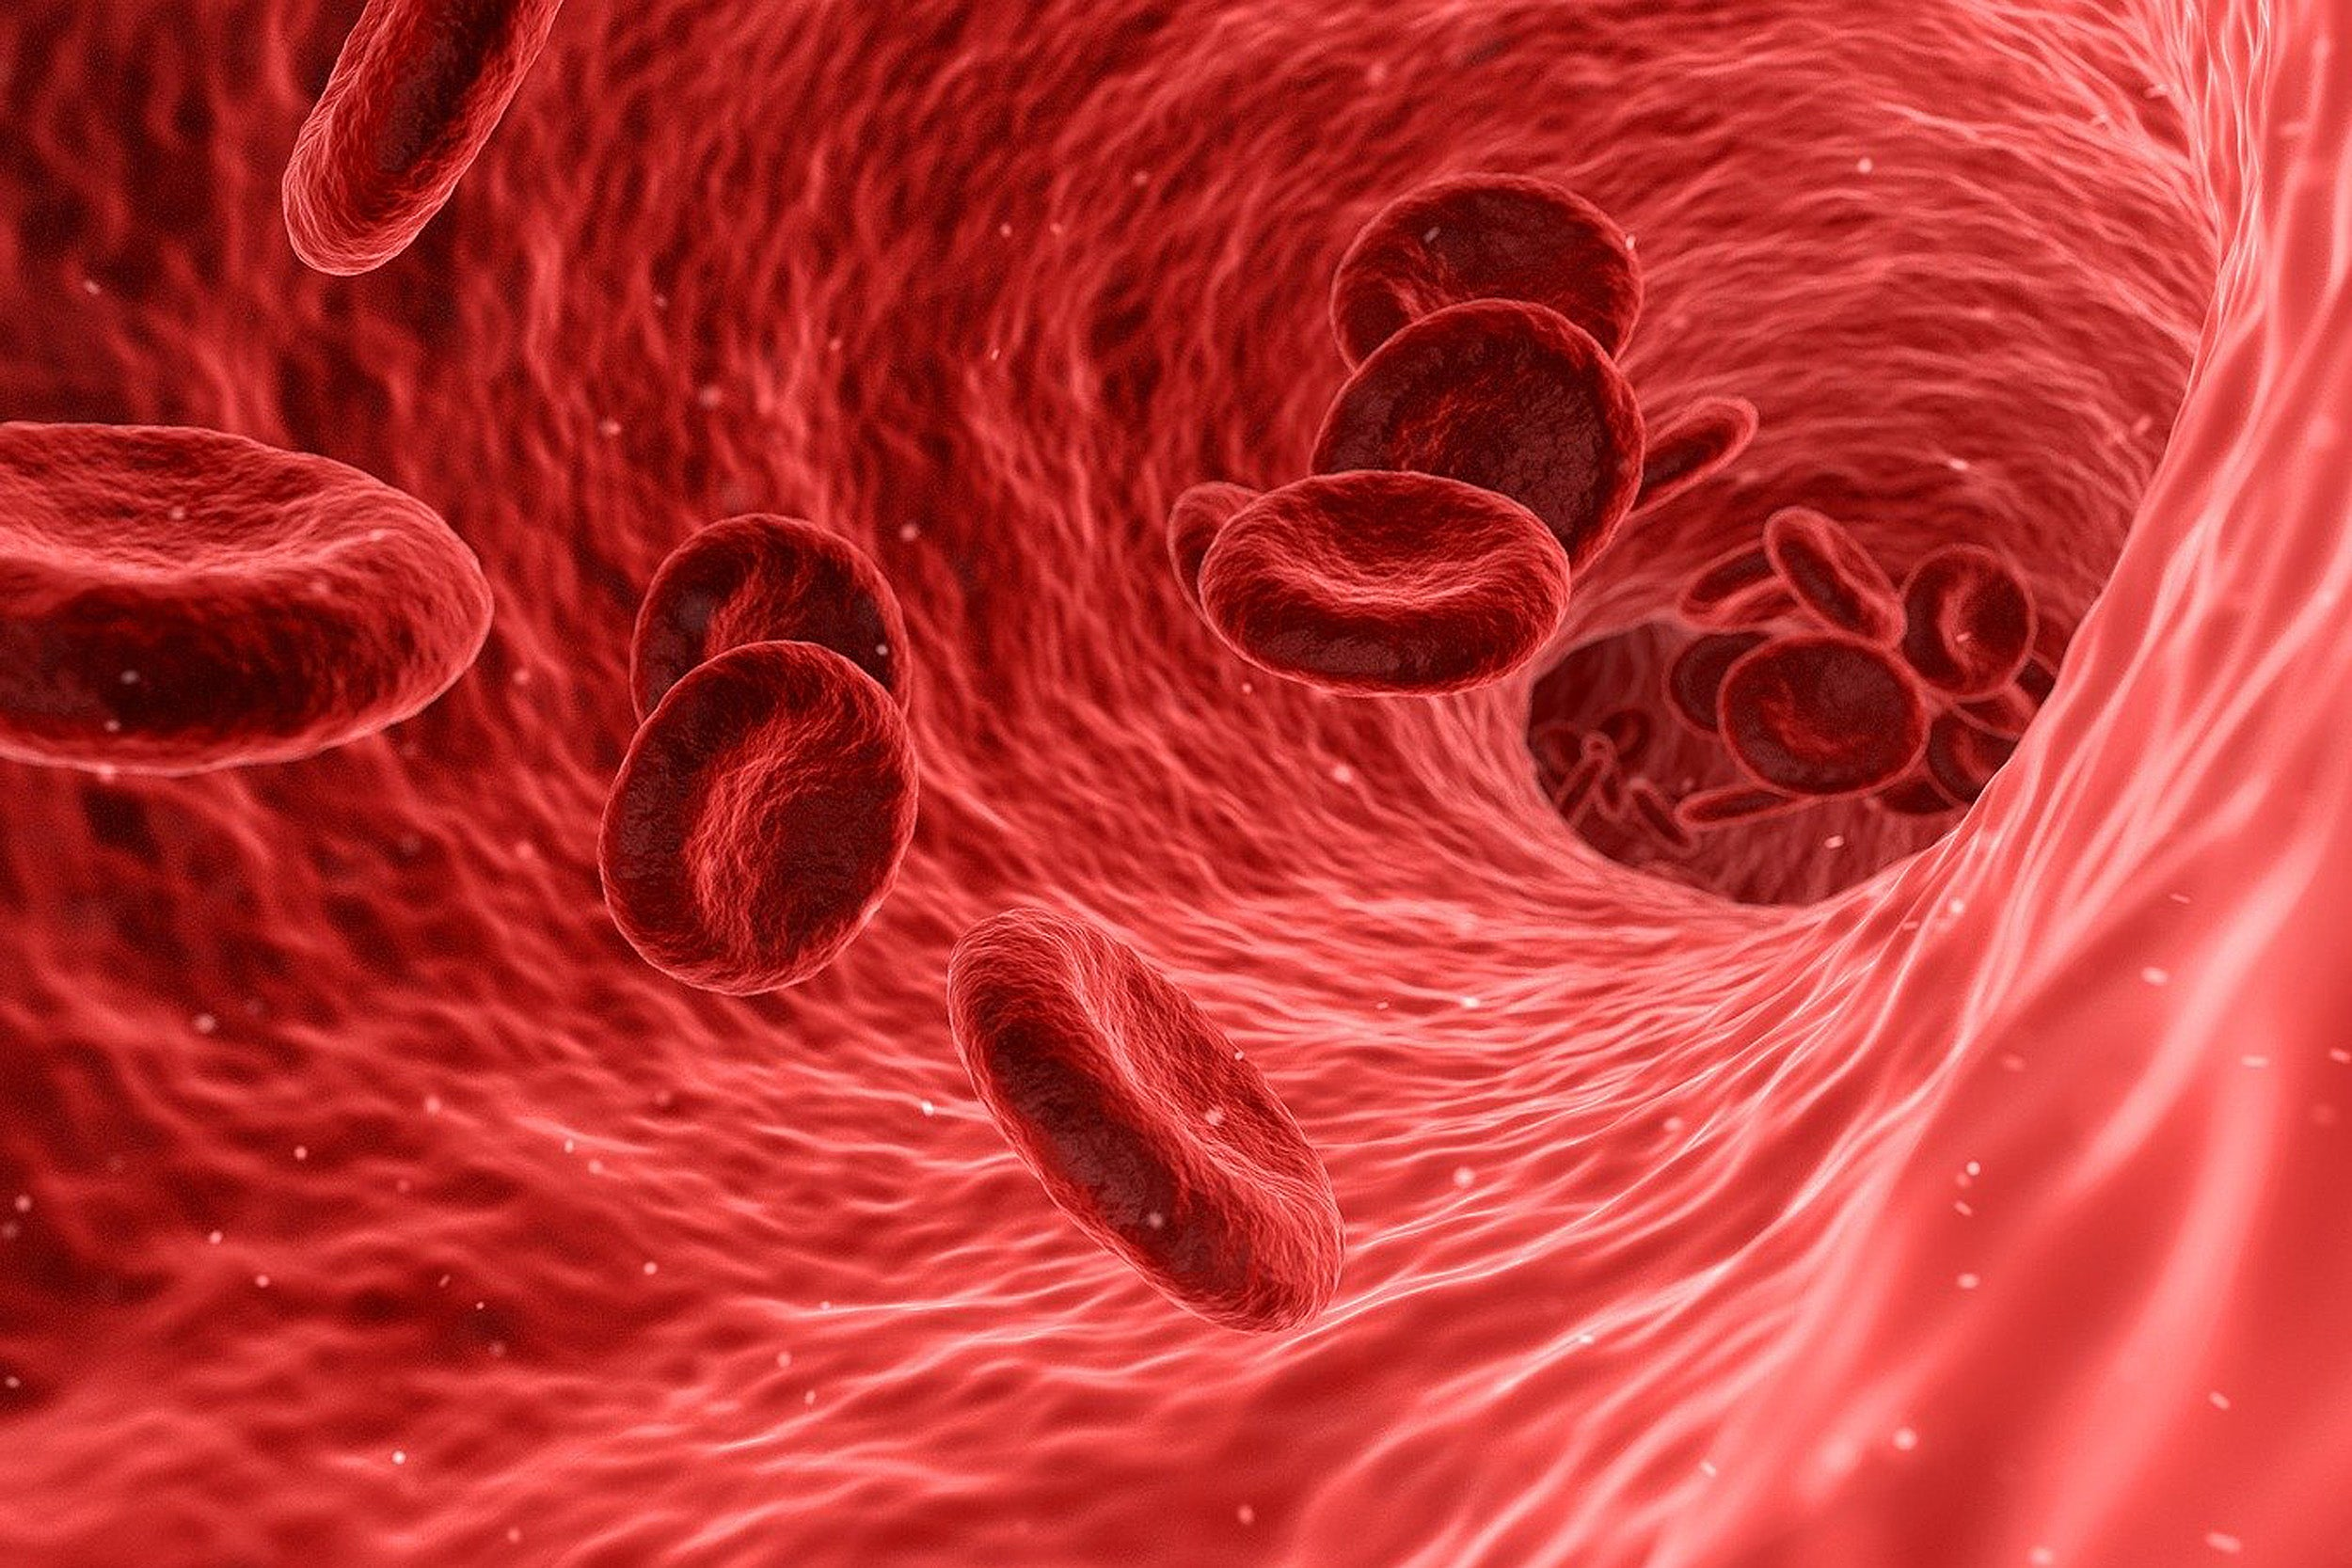 Blood cells.